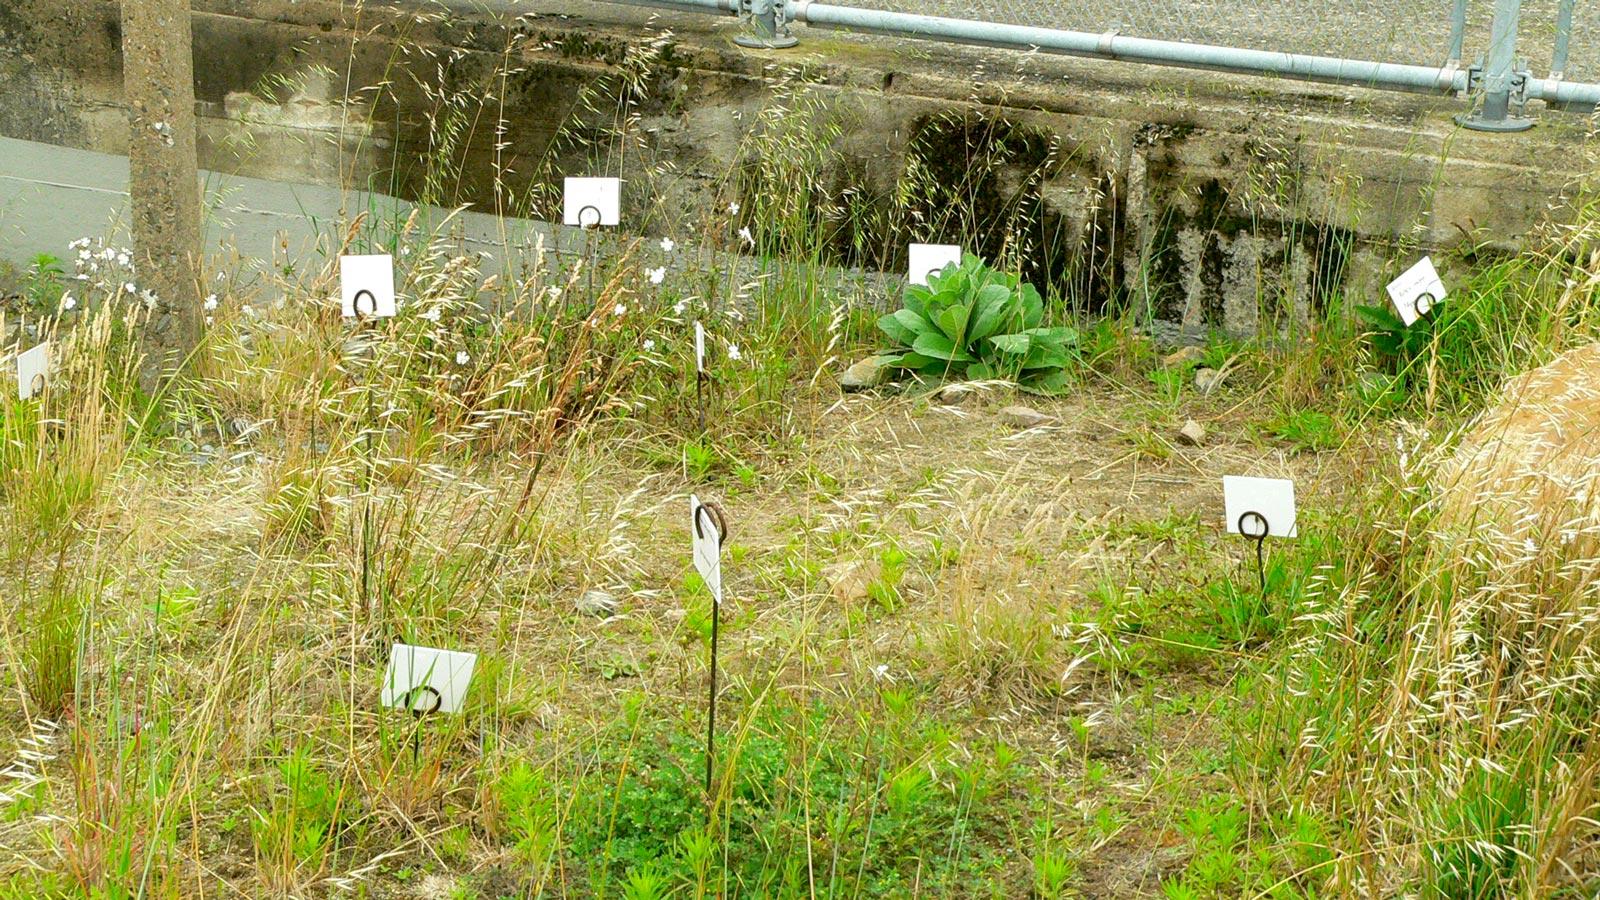 Eskis paysagistes jardins du tiers paysage for Paysage de jardin